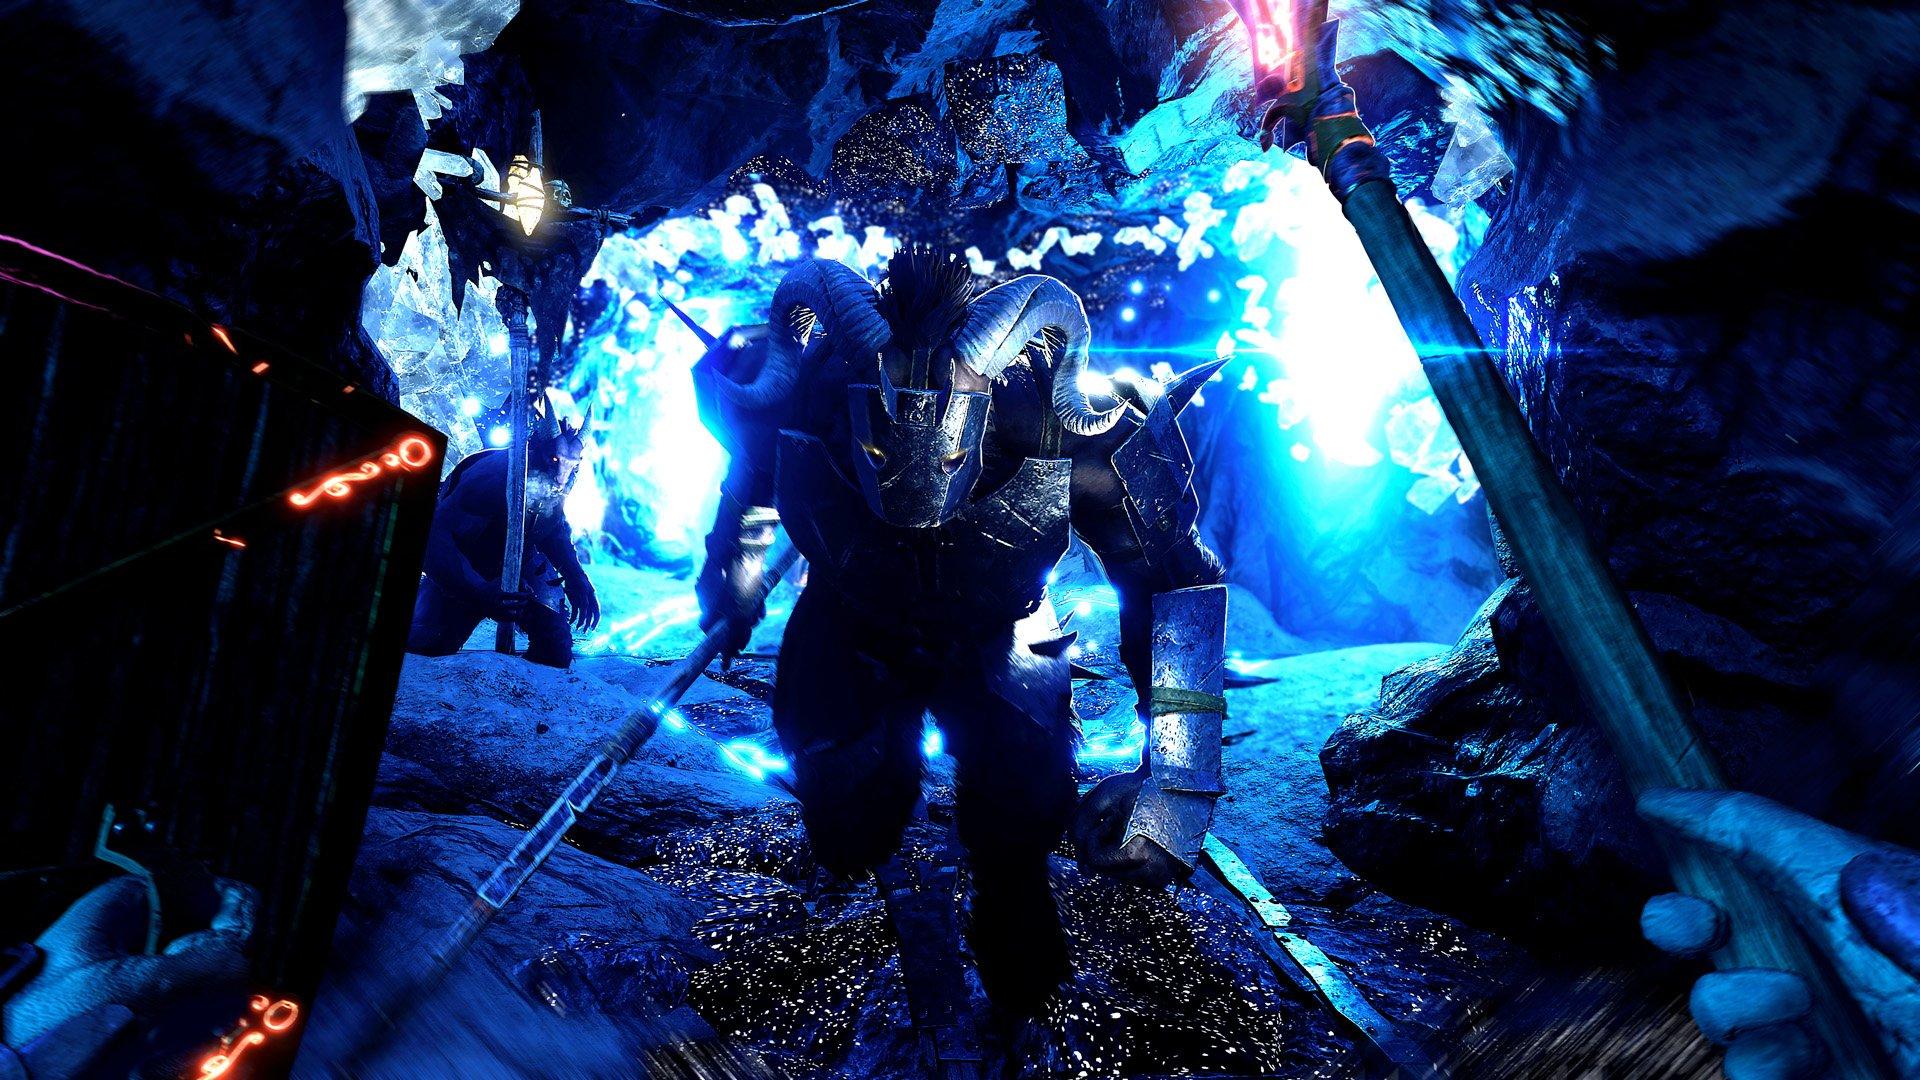 Warhammer Vermintide 2 - تصدر رياح Magic DLC الأسبوع المقبل